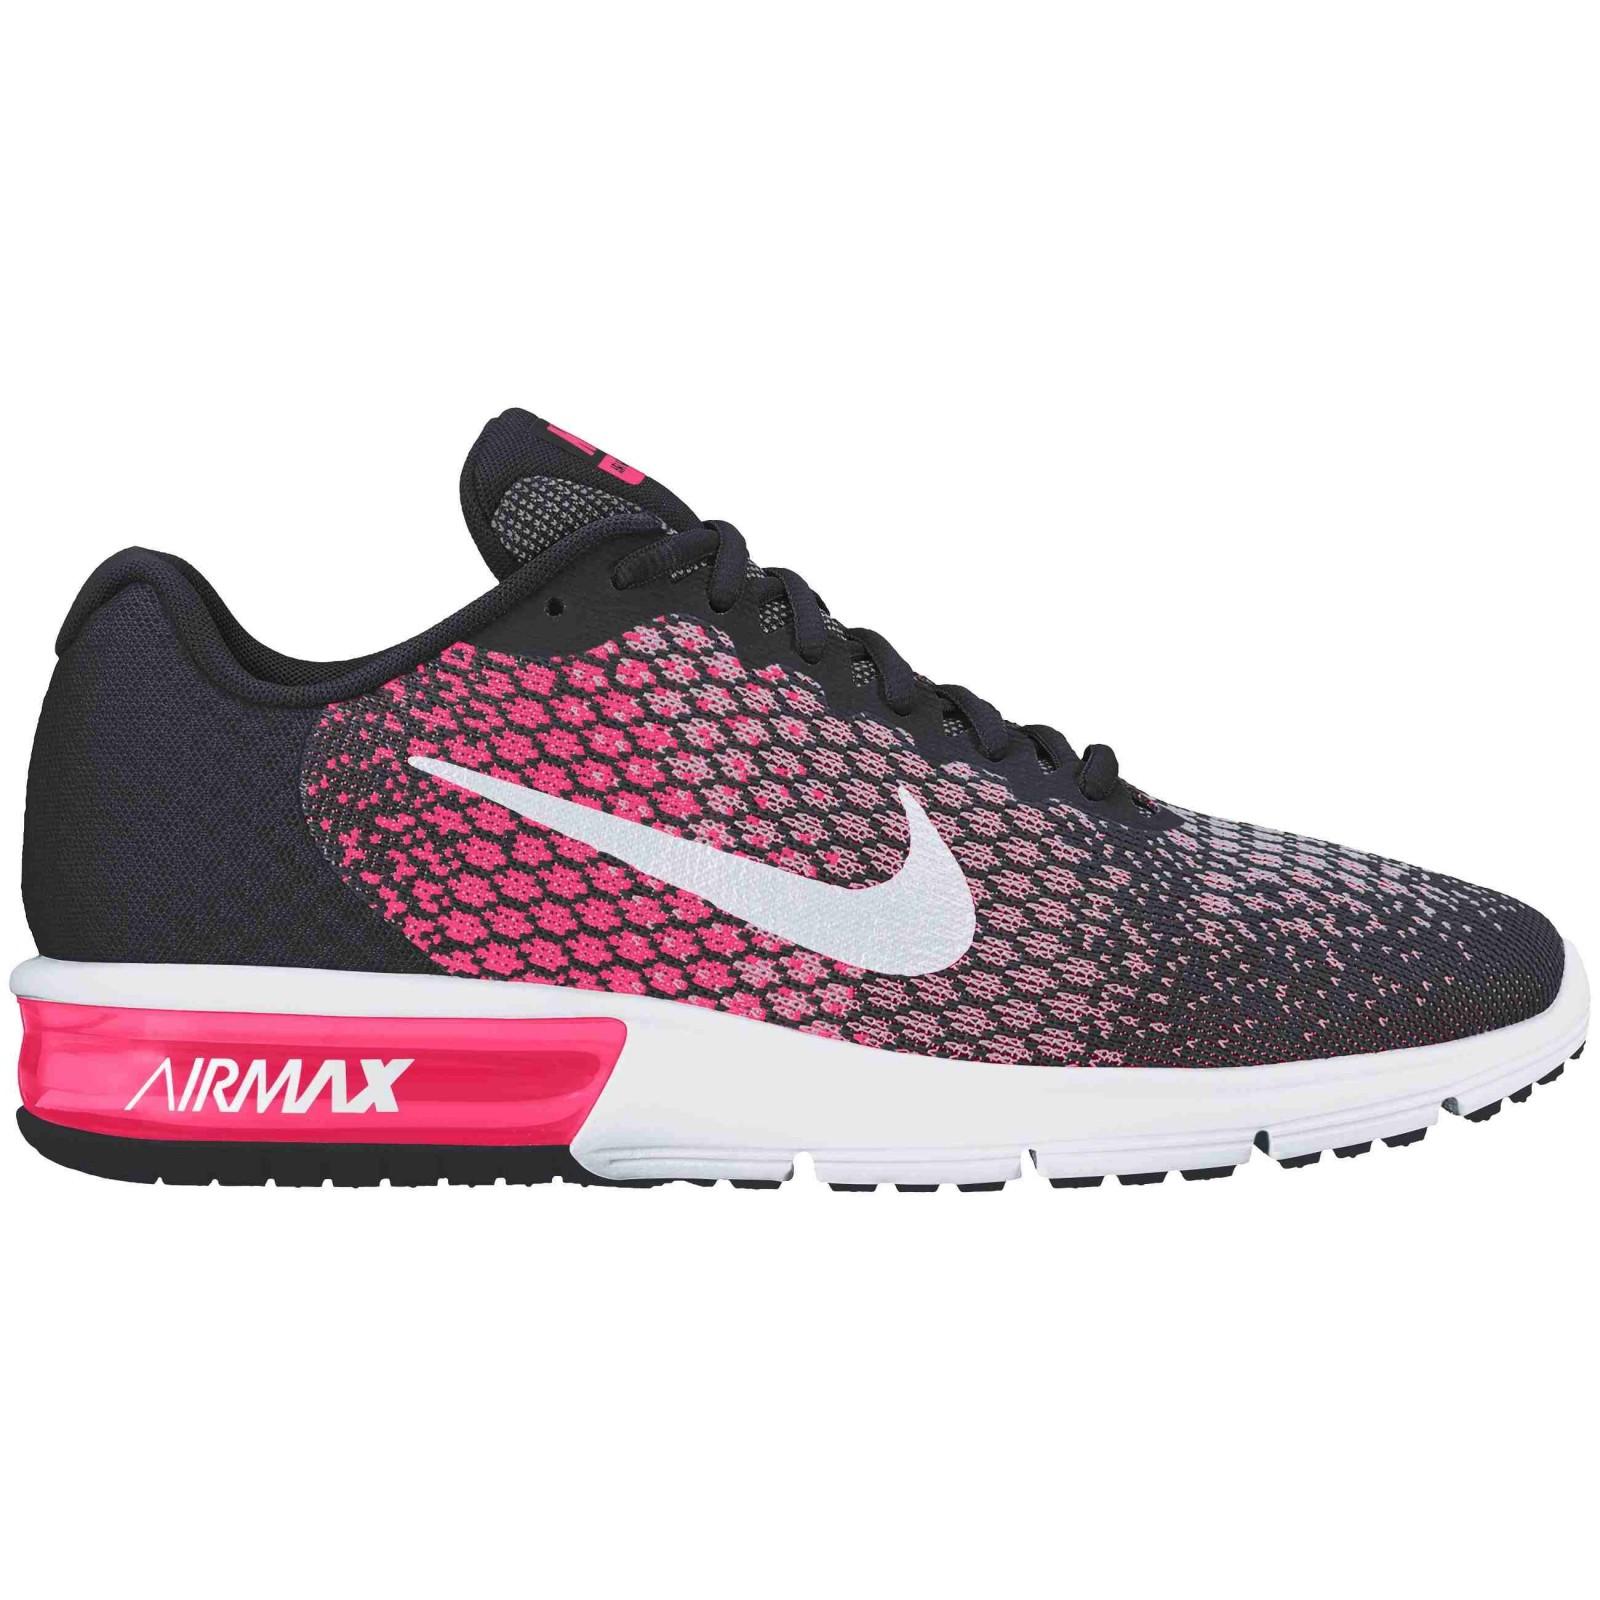 Dámské tenisky Nike WMNS AIR MAX SEQUENT 2  fe58b4442c